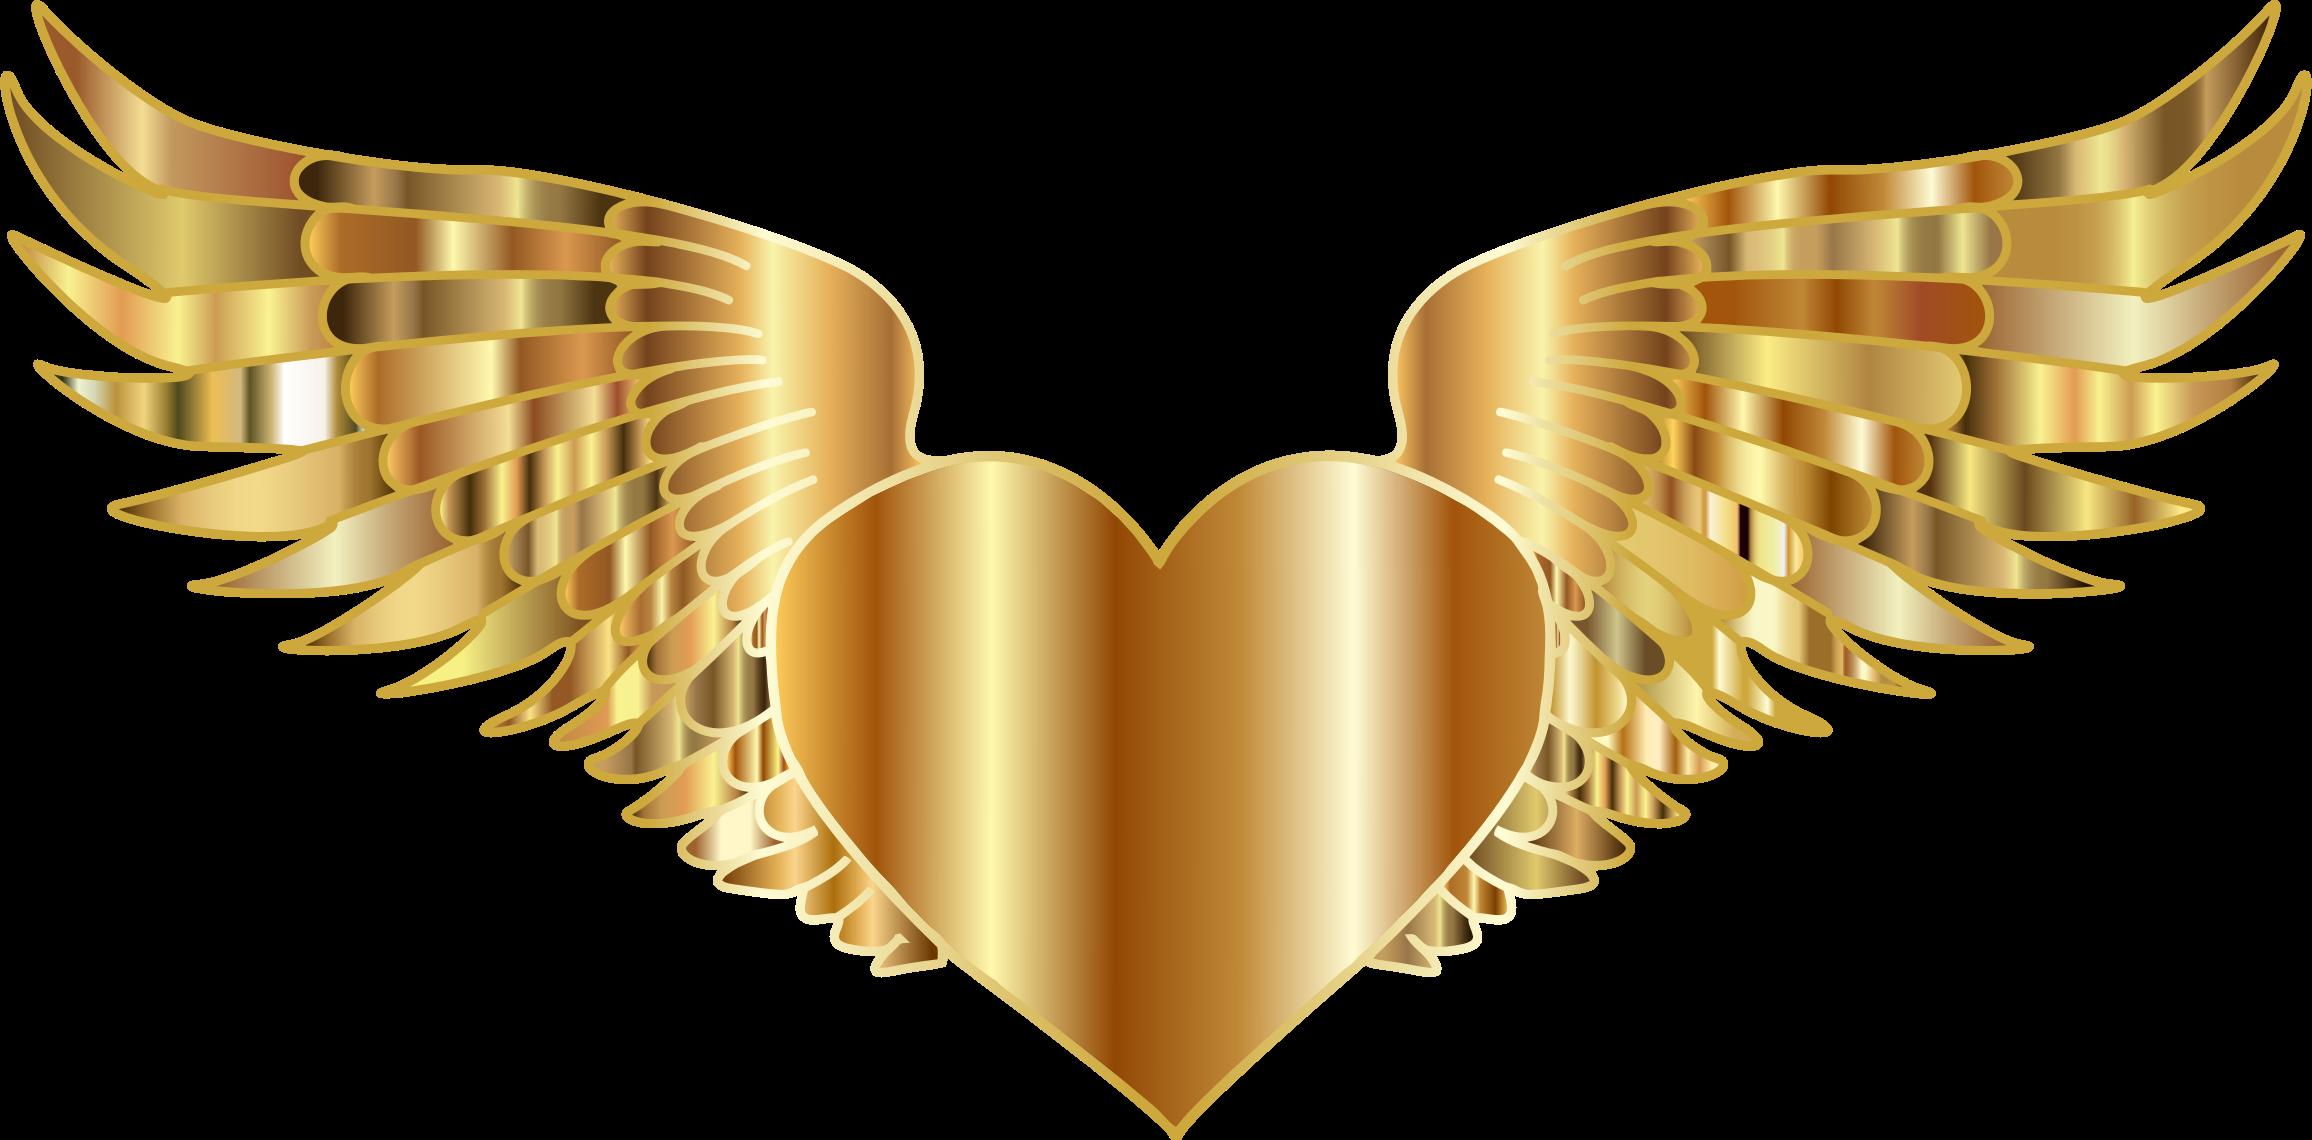 Gold heart clipart svg transparent Clipart - Golden Flying Heart svg transparent